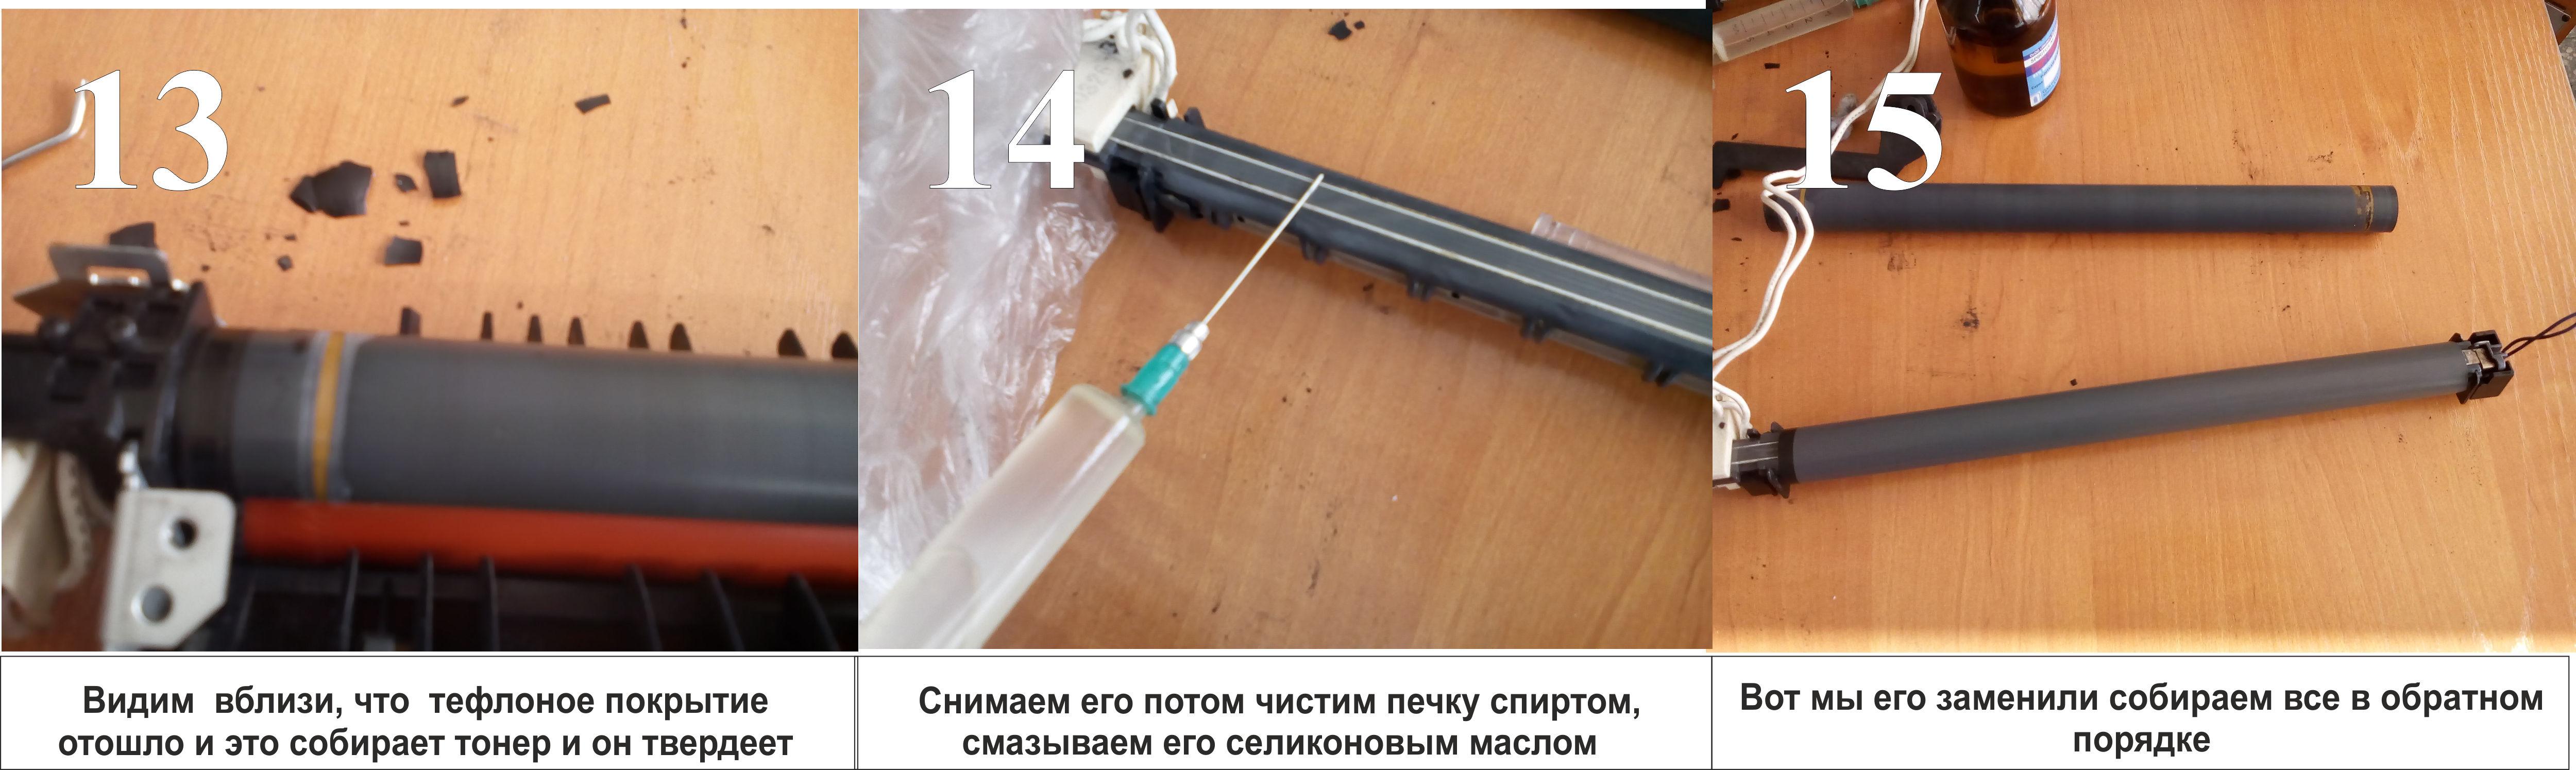 http://s3.uploads.ru/IKRrf.jpg